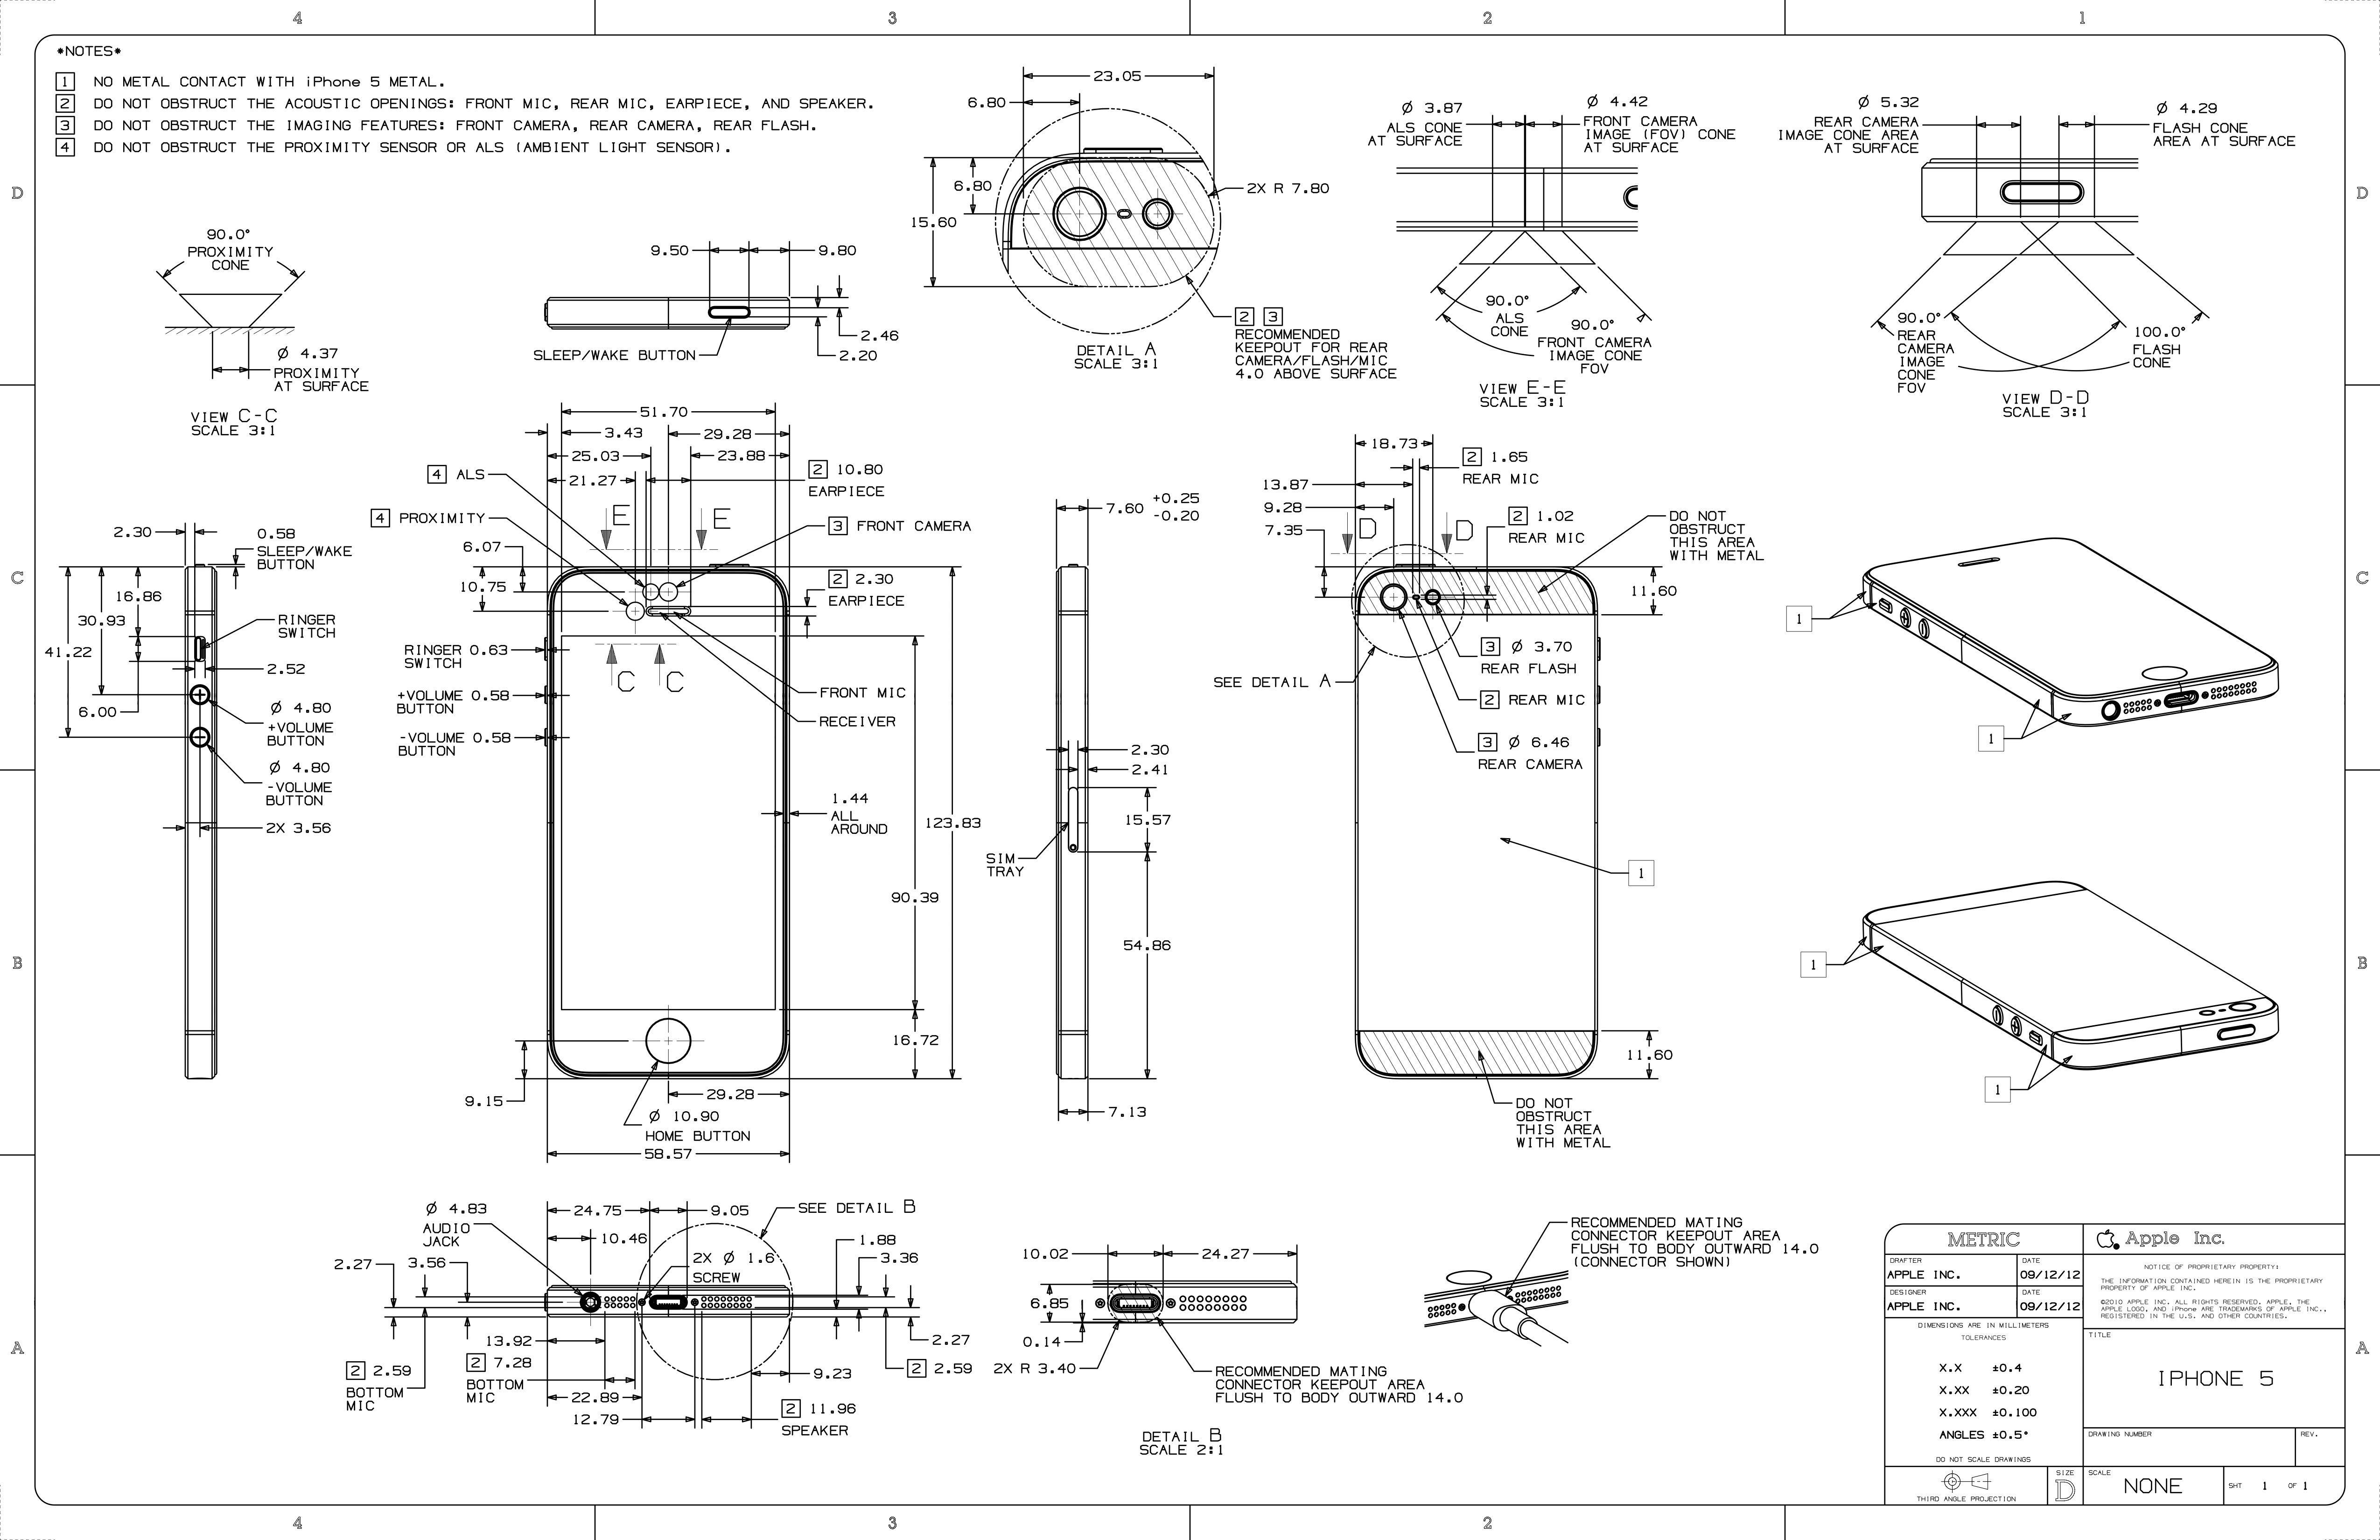 iPhone 5 schematics -- helpful for designing accessories/cases ...